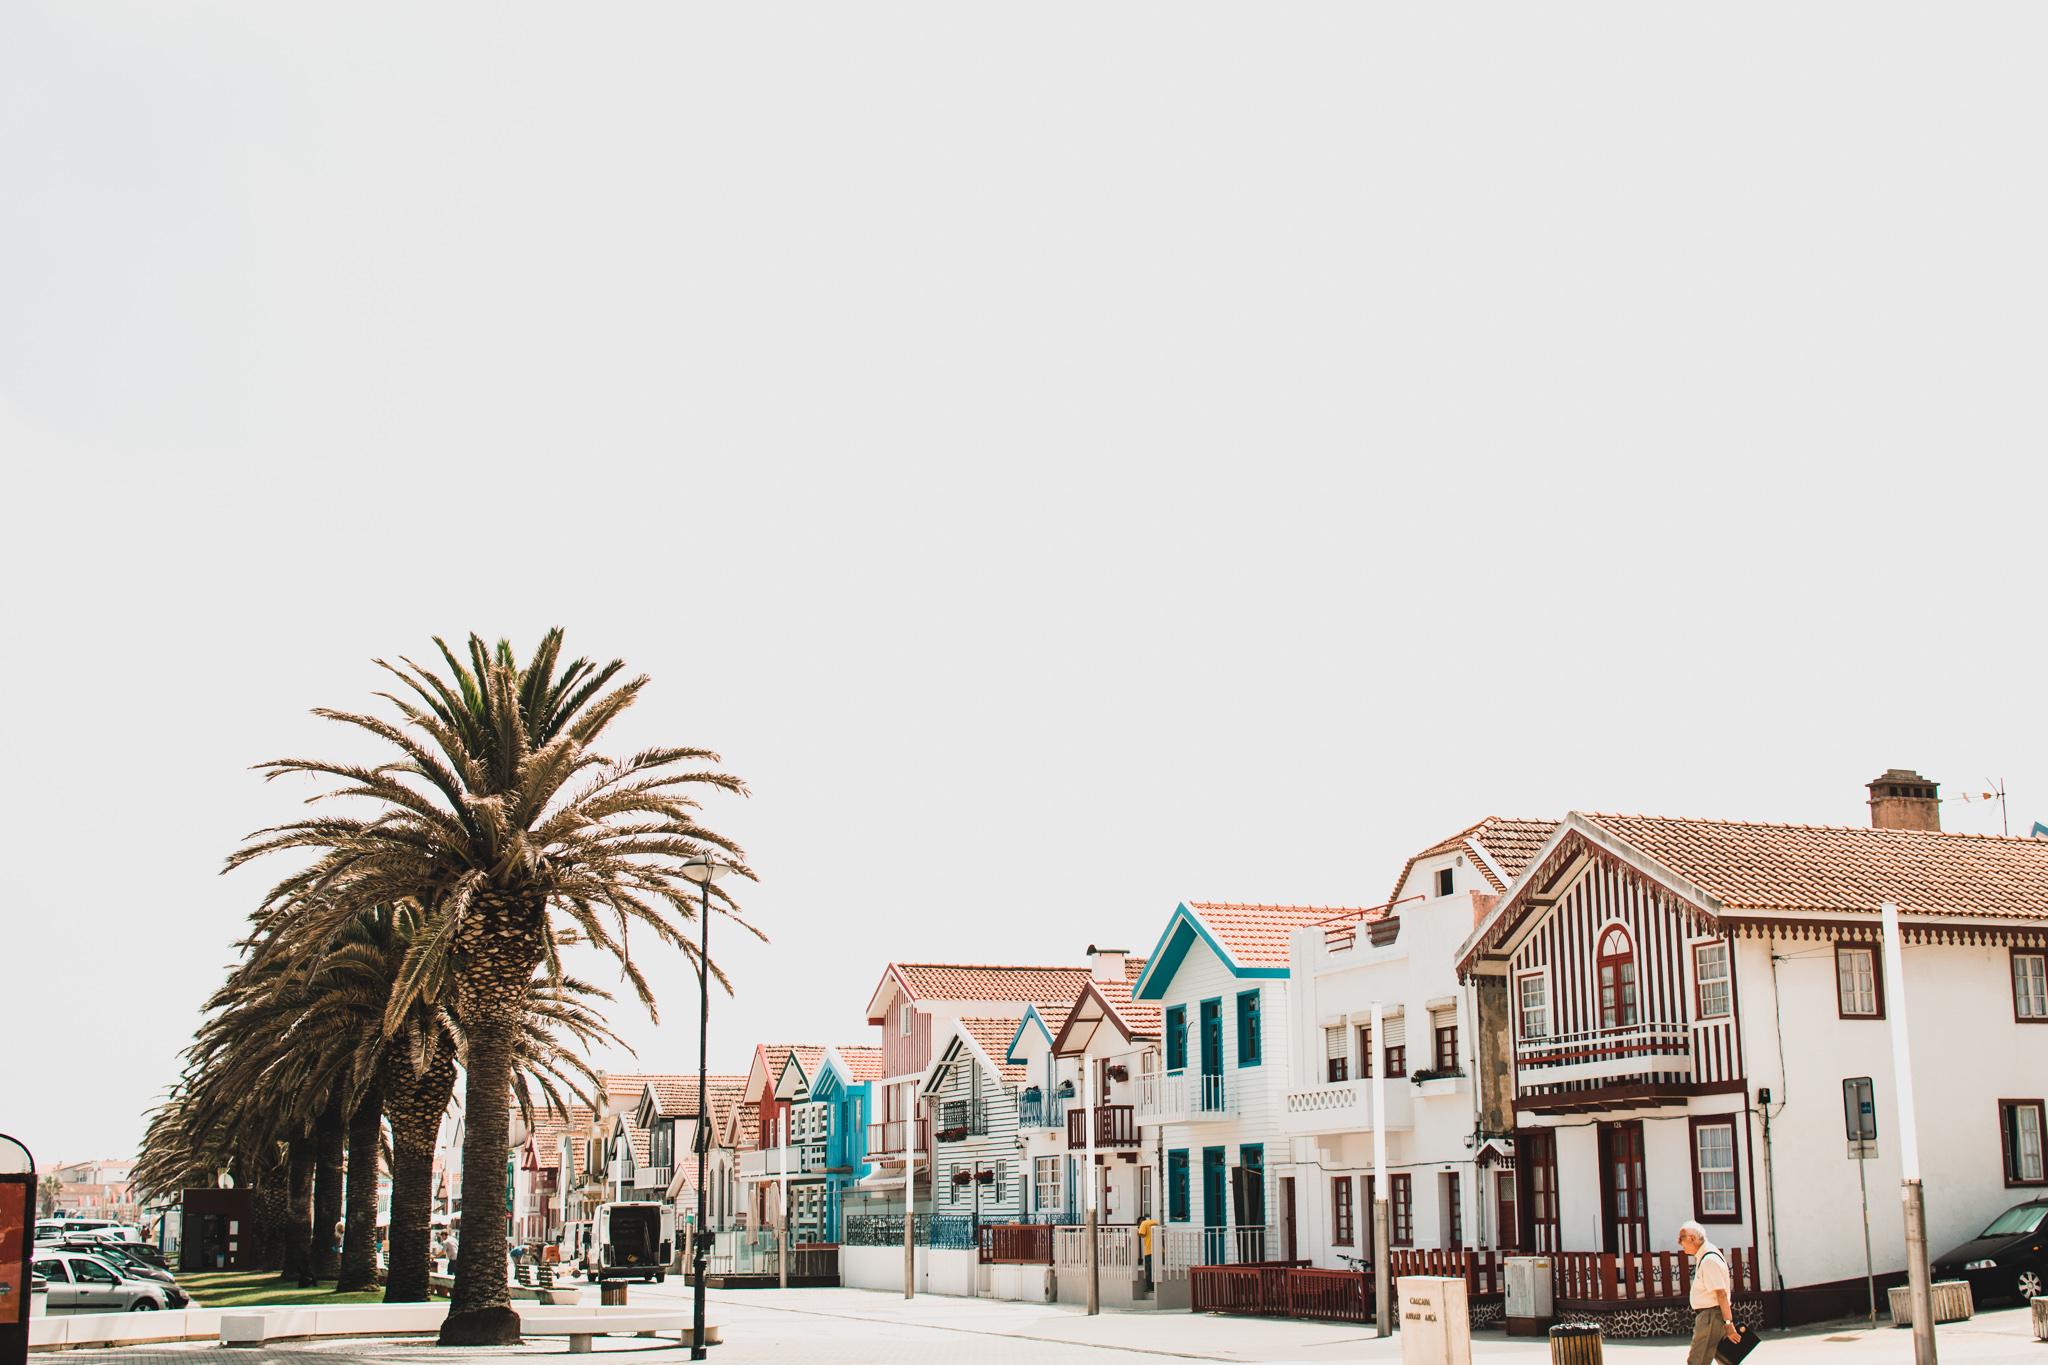 Costa Nova Portugal